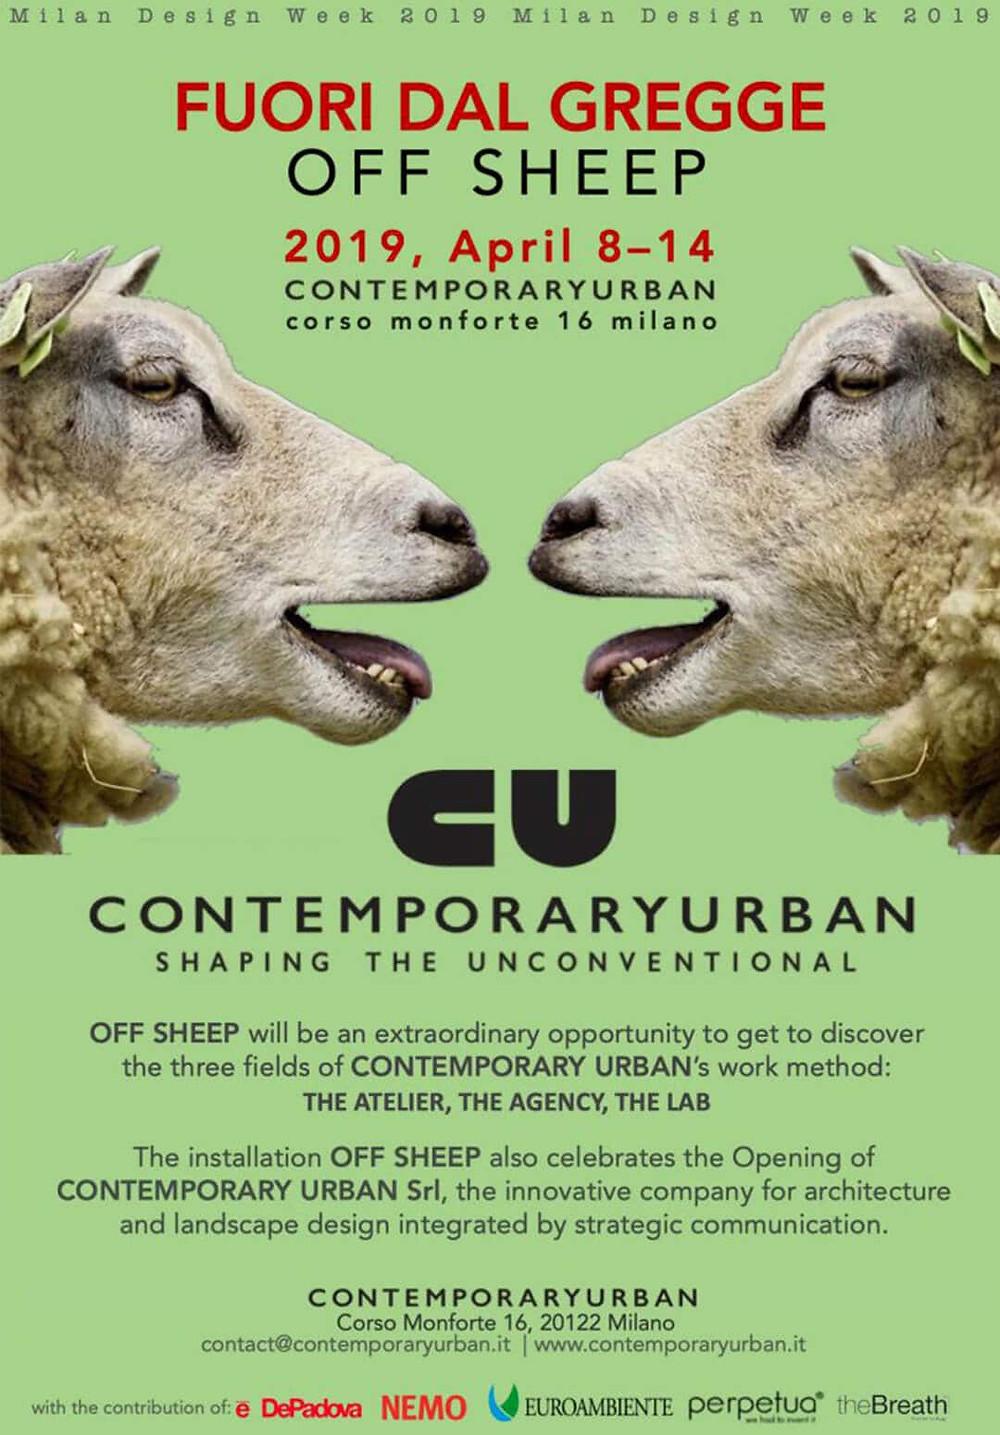 Off sheep - Contemporary Urban